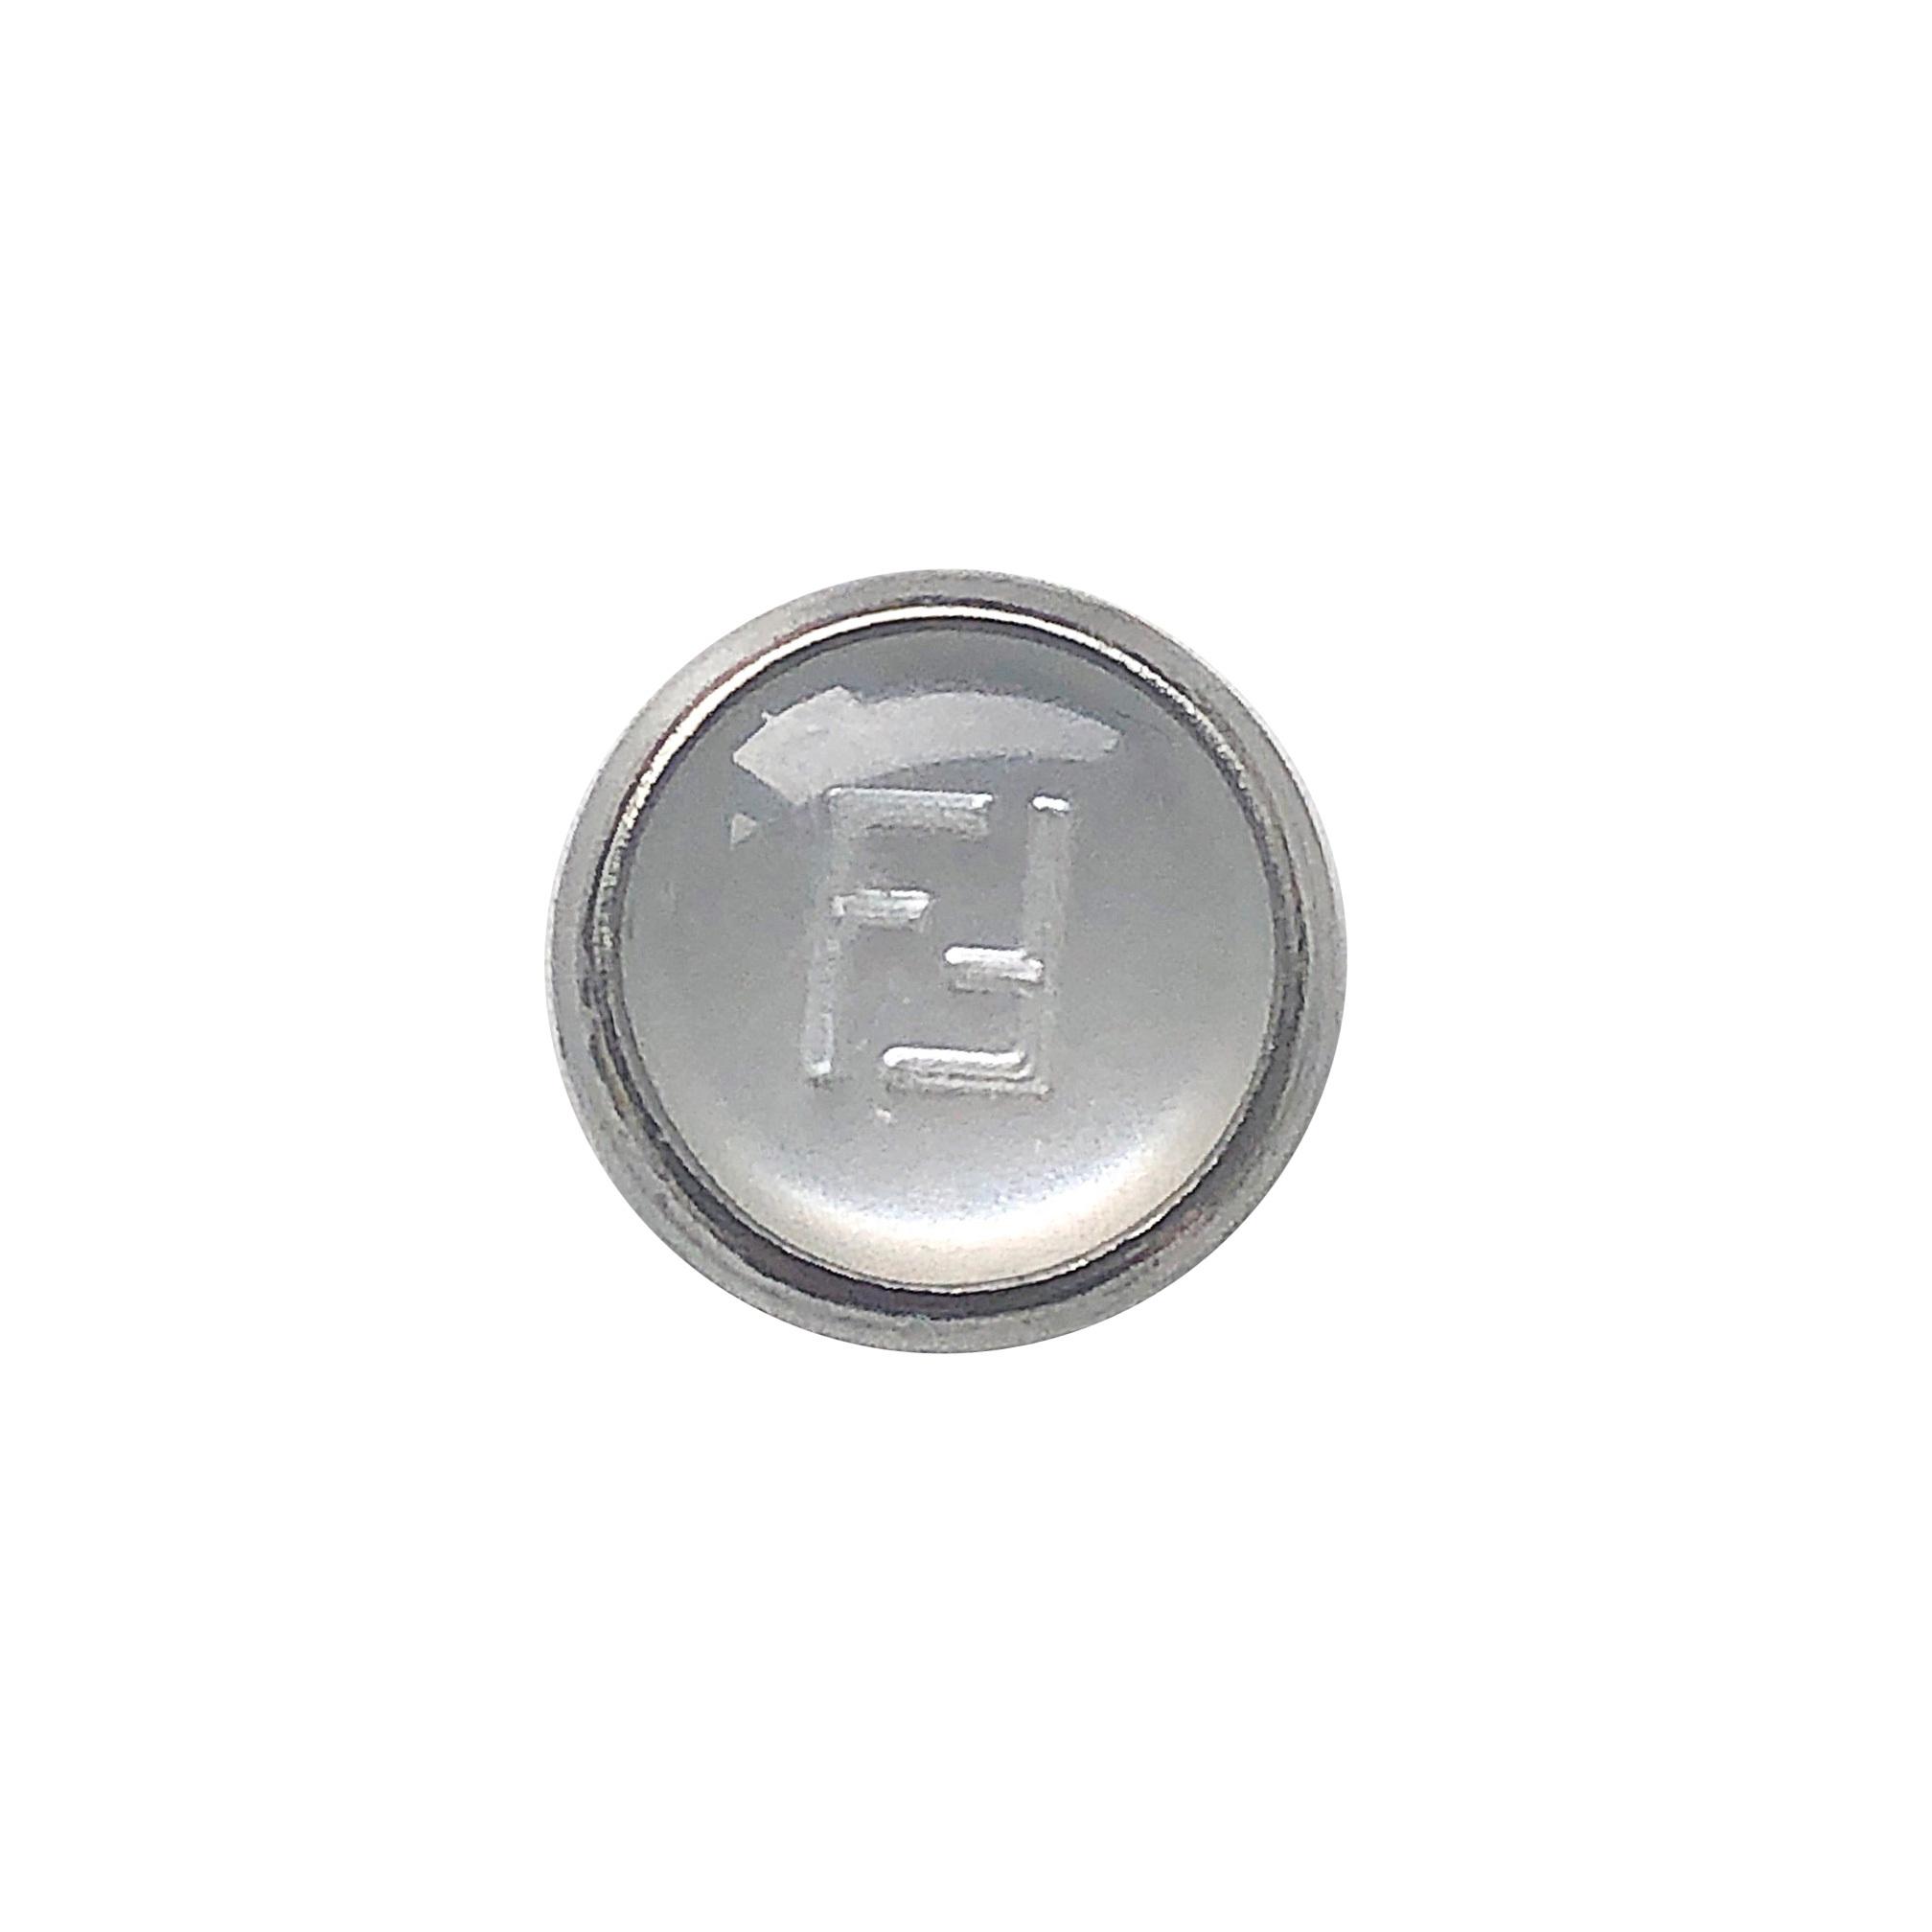 【VINTAGE FENDI BUTTON】シルバーホワイト ボタン